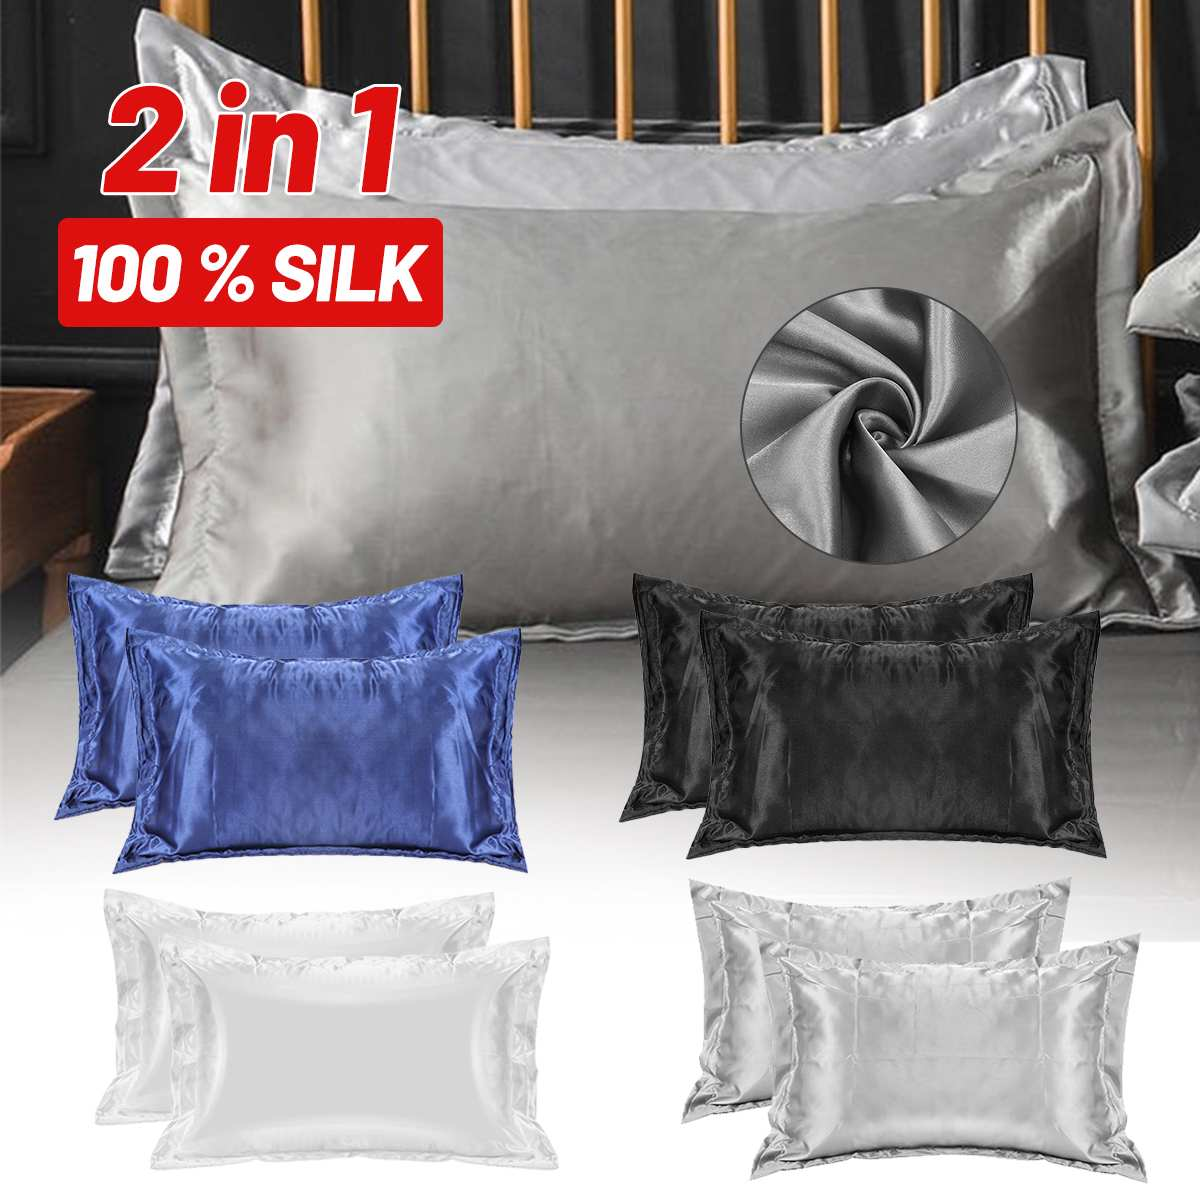 2pcs Stain Silk Pillowcase 48X74cm Bedding Comfortable Smooth Solid Color Decorative Pillow Case Cover Home Textile